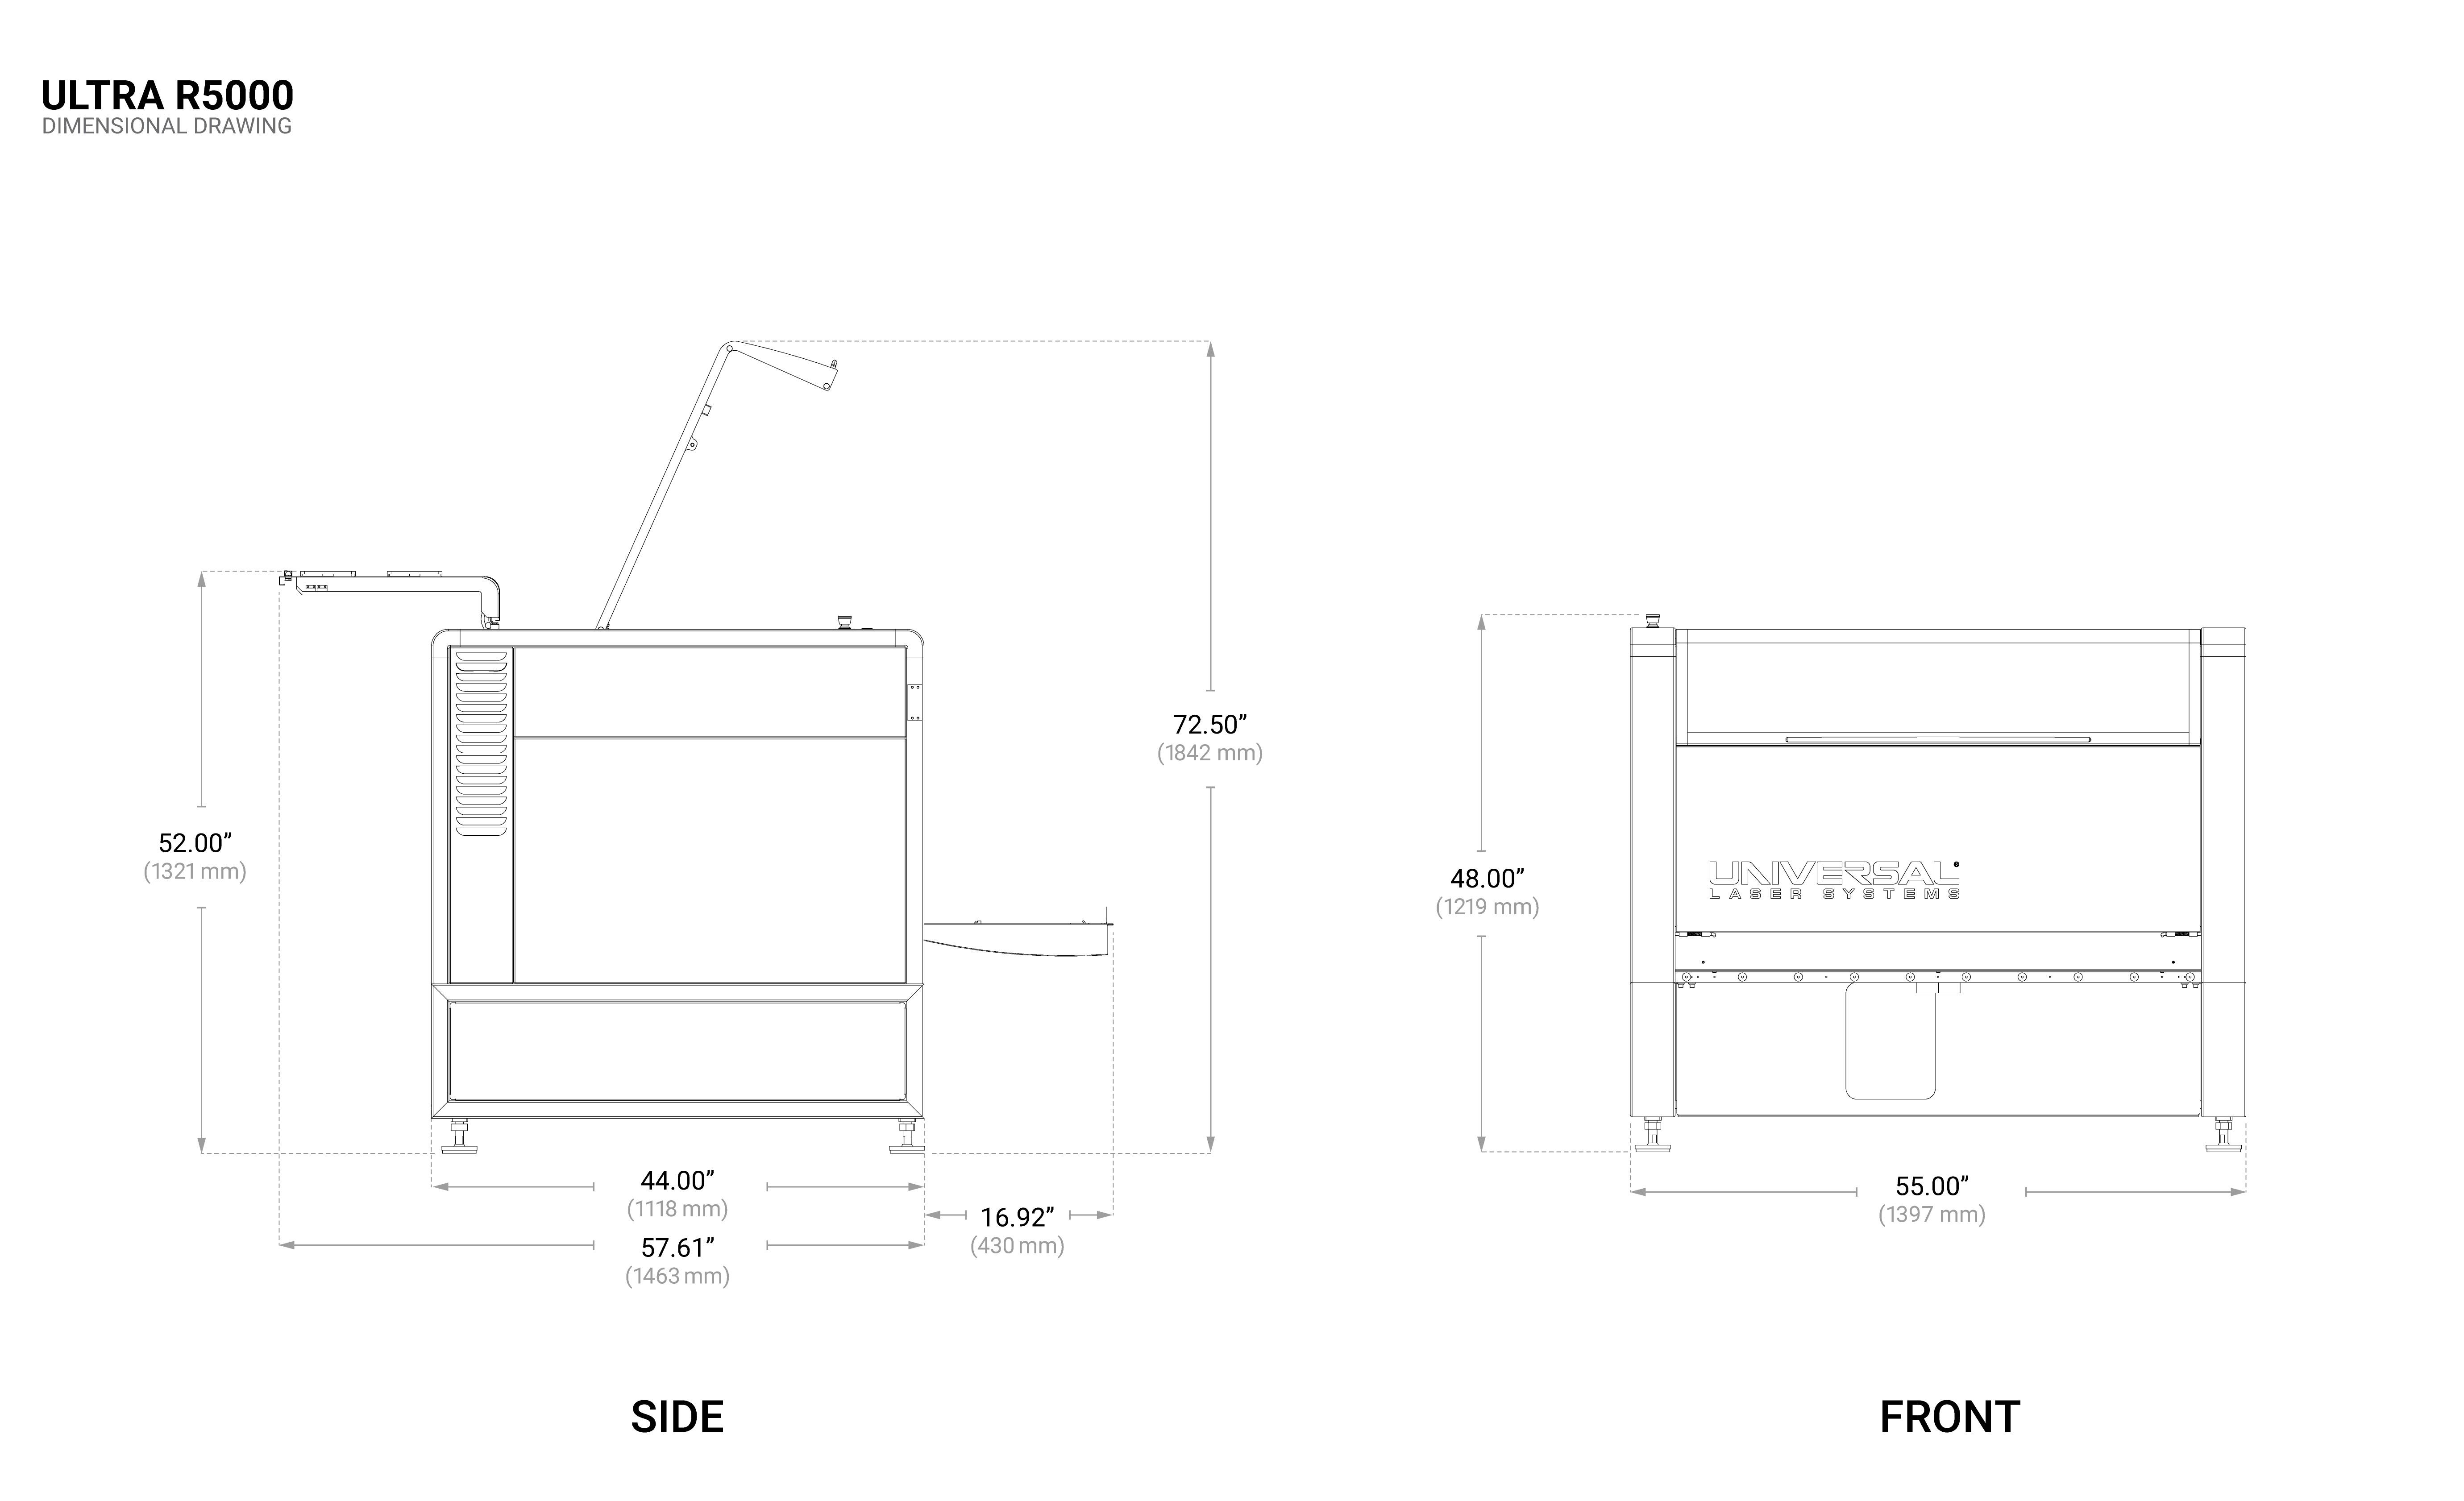 ULTRA R5000 Dimensional Drawing